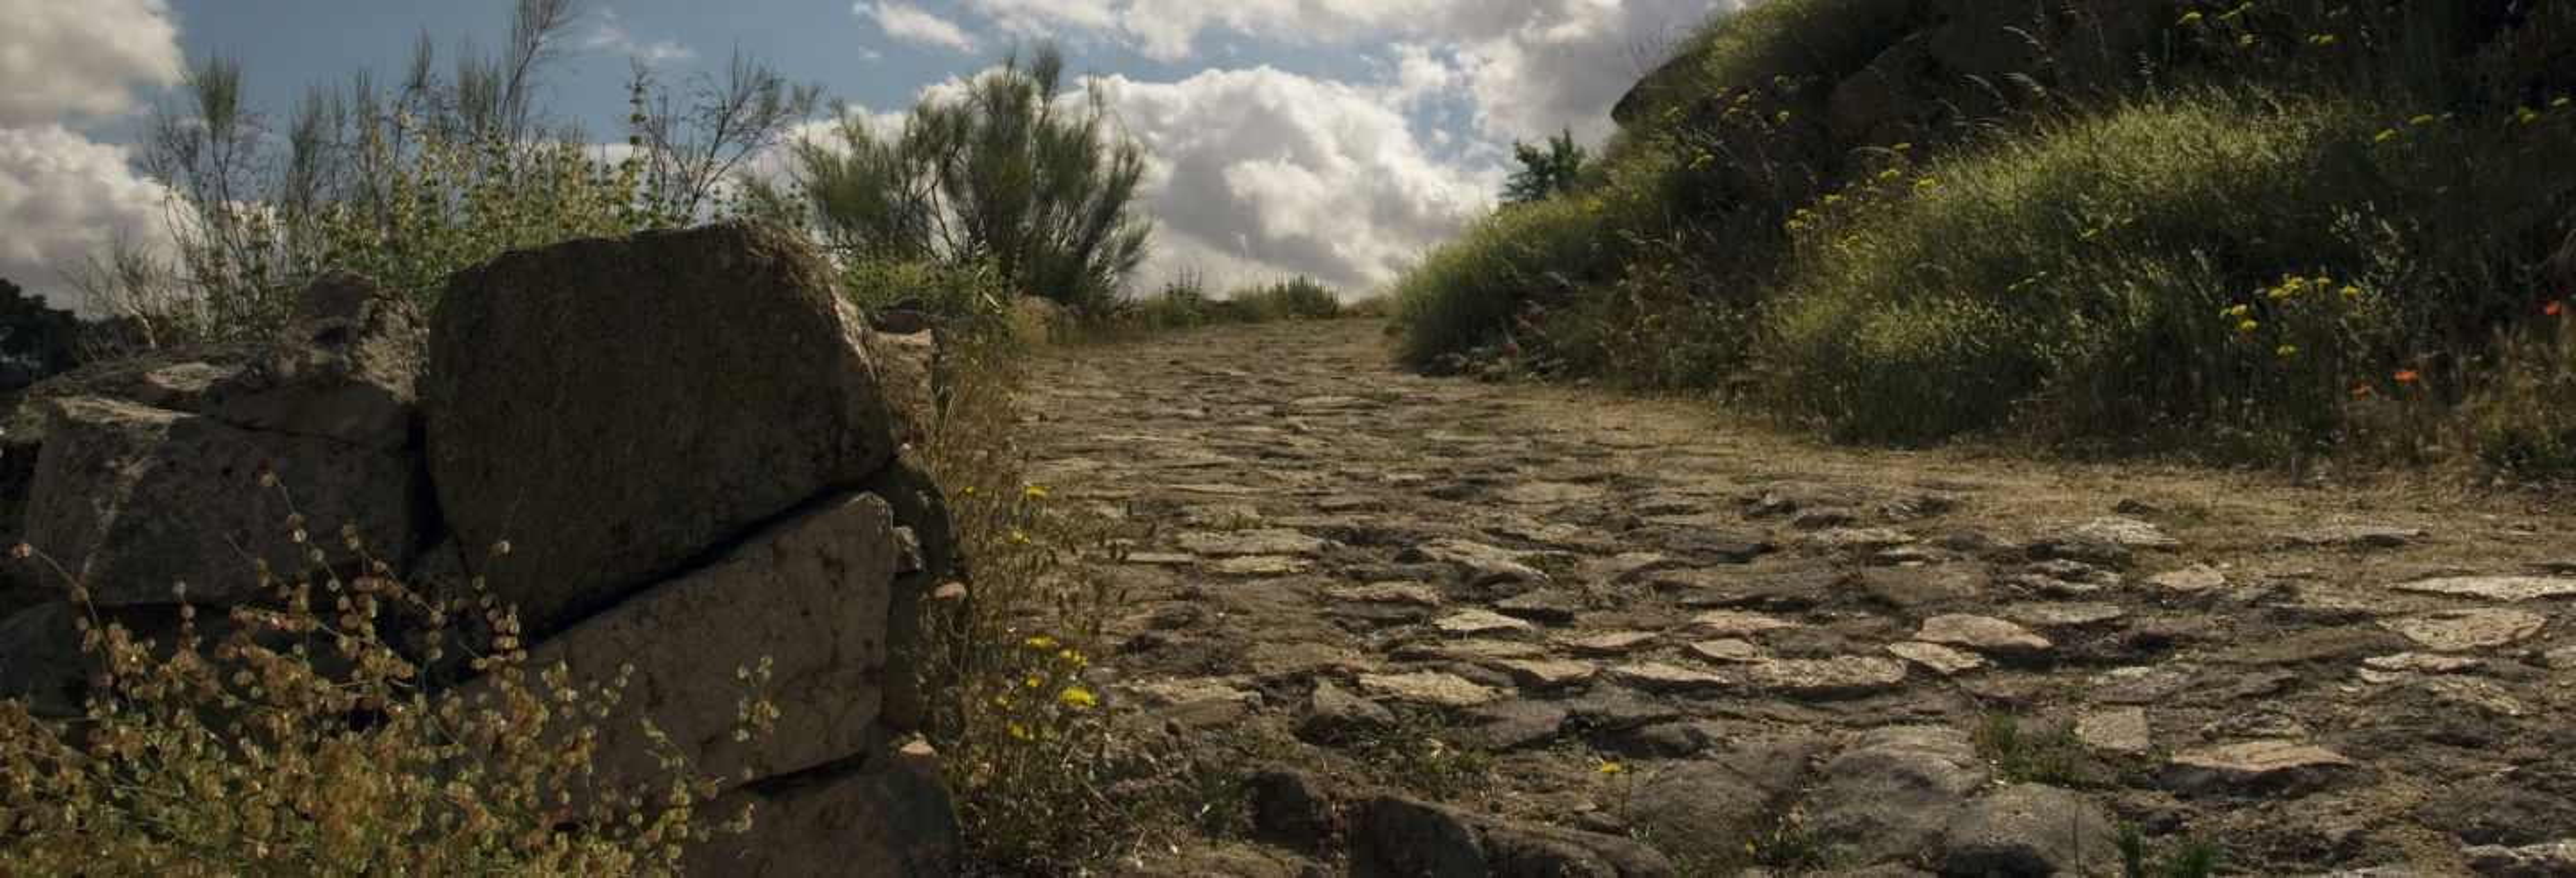 Tour por la Ruta Bética Romana